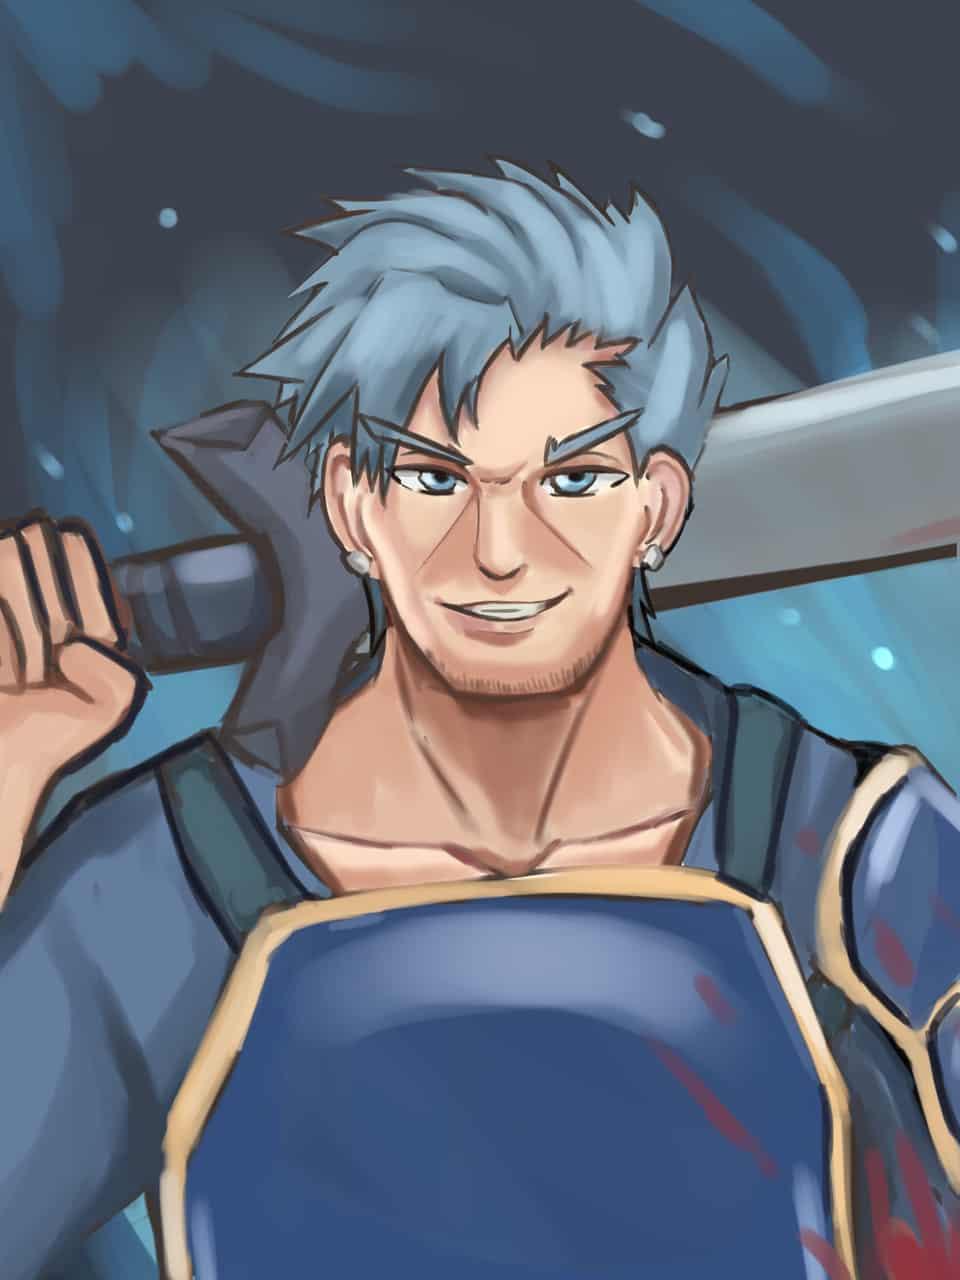 Bercouli Illust of Pempem sci-fi fantasy anime blue cool portrait fantasyart Sword_Art_Online pastel